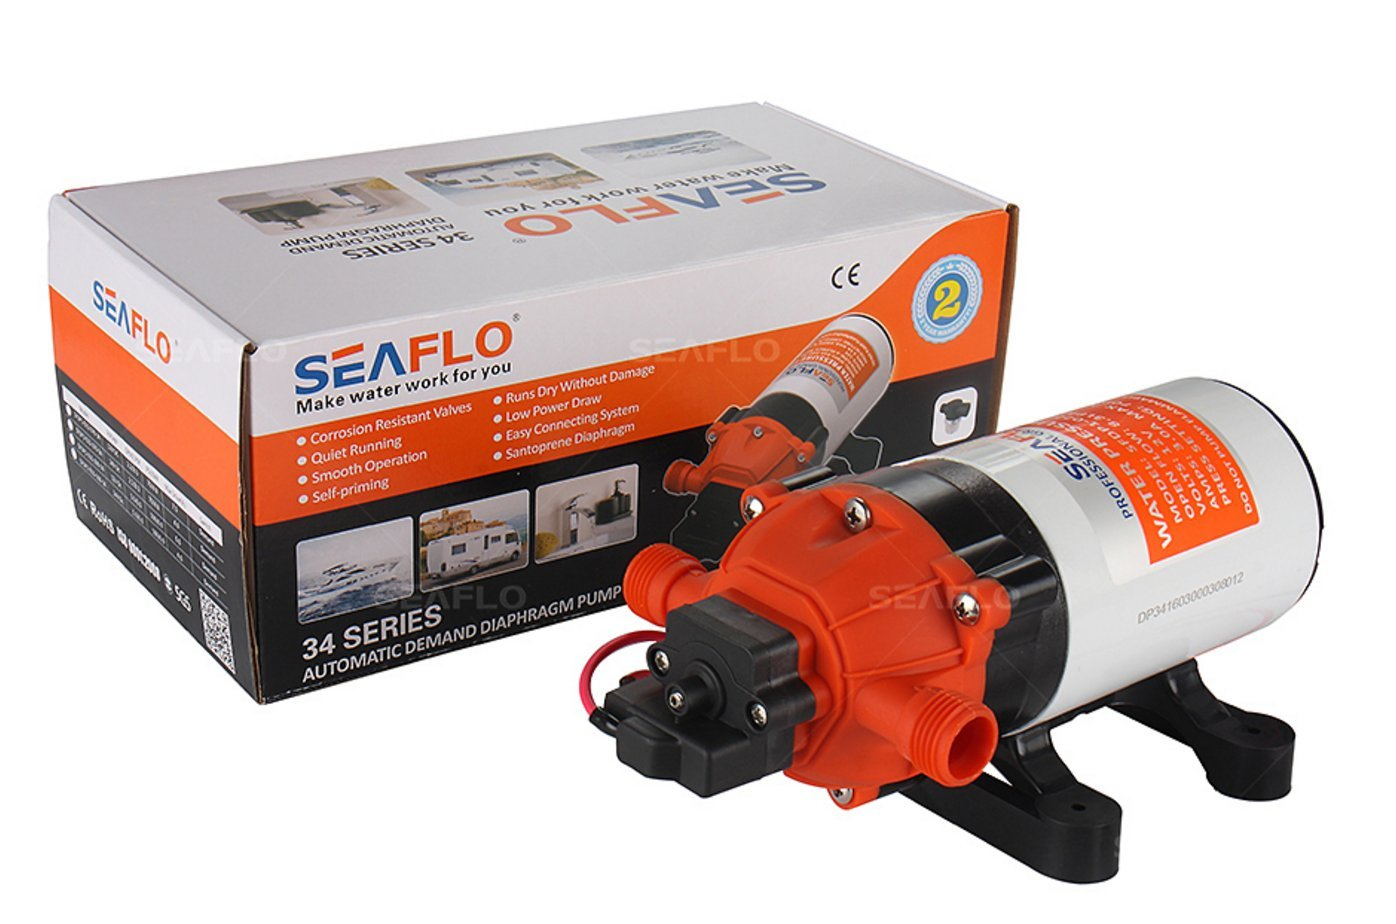 SEAFLO 12V 1.6 GPM 100 PSI 34-Series Water Pressure Diaphragm Pump by Seaflo (Image #4)